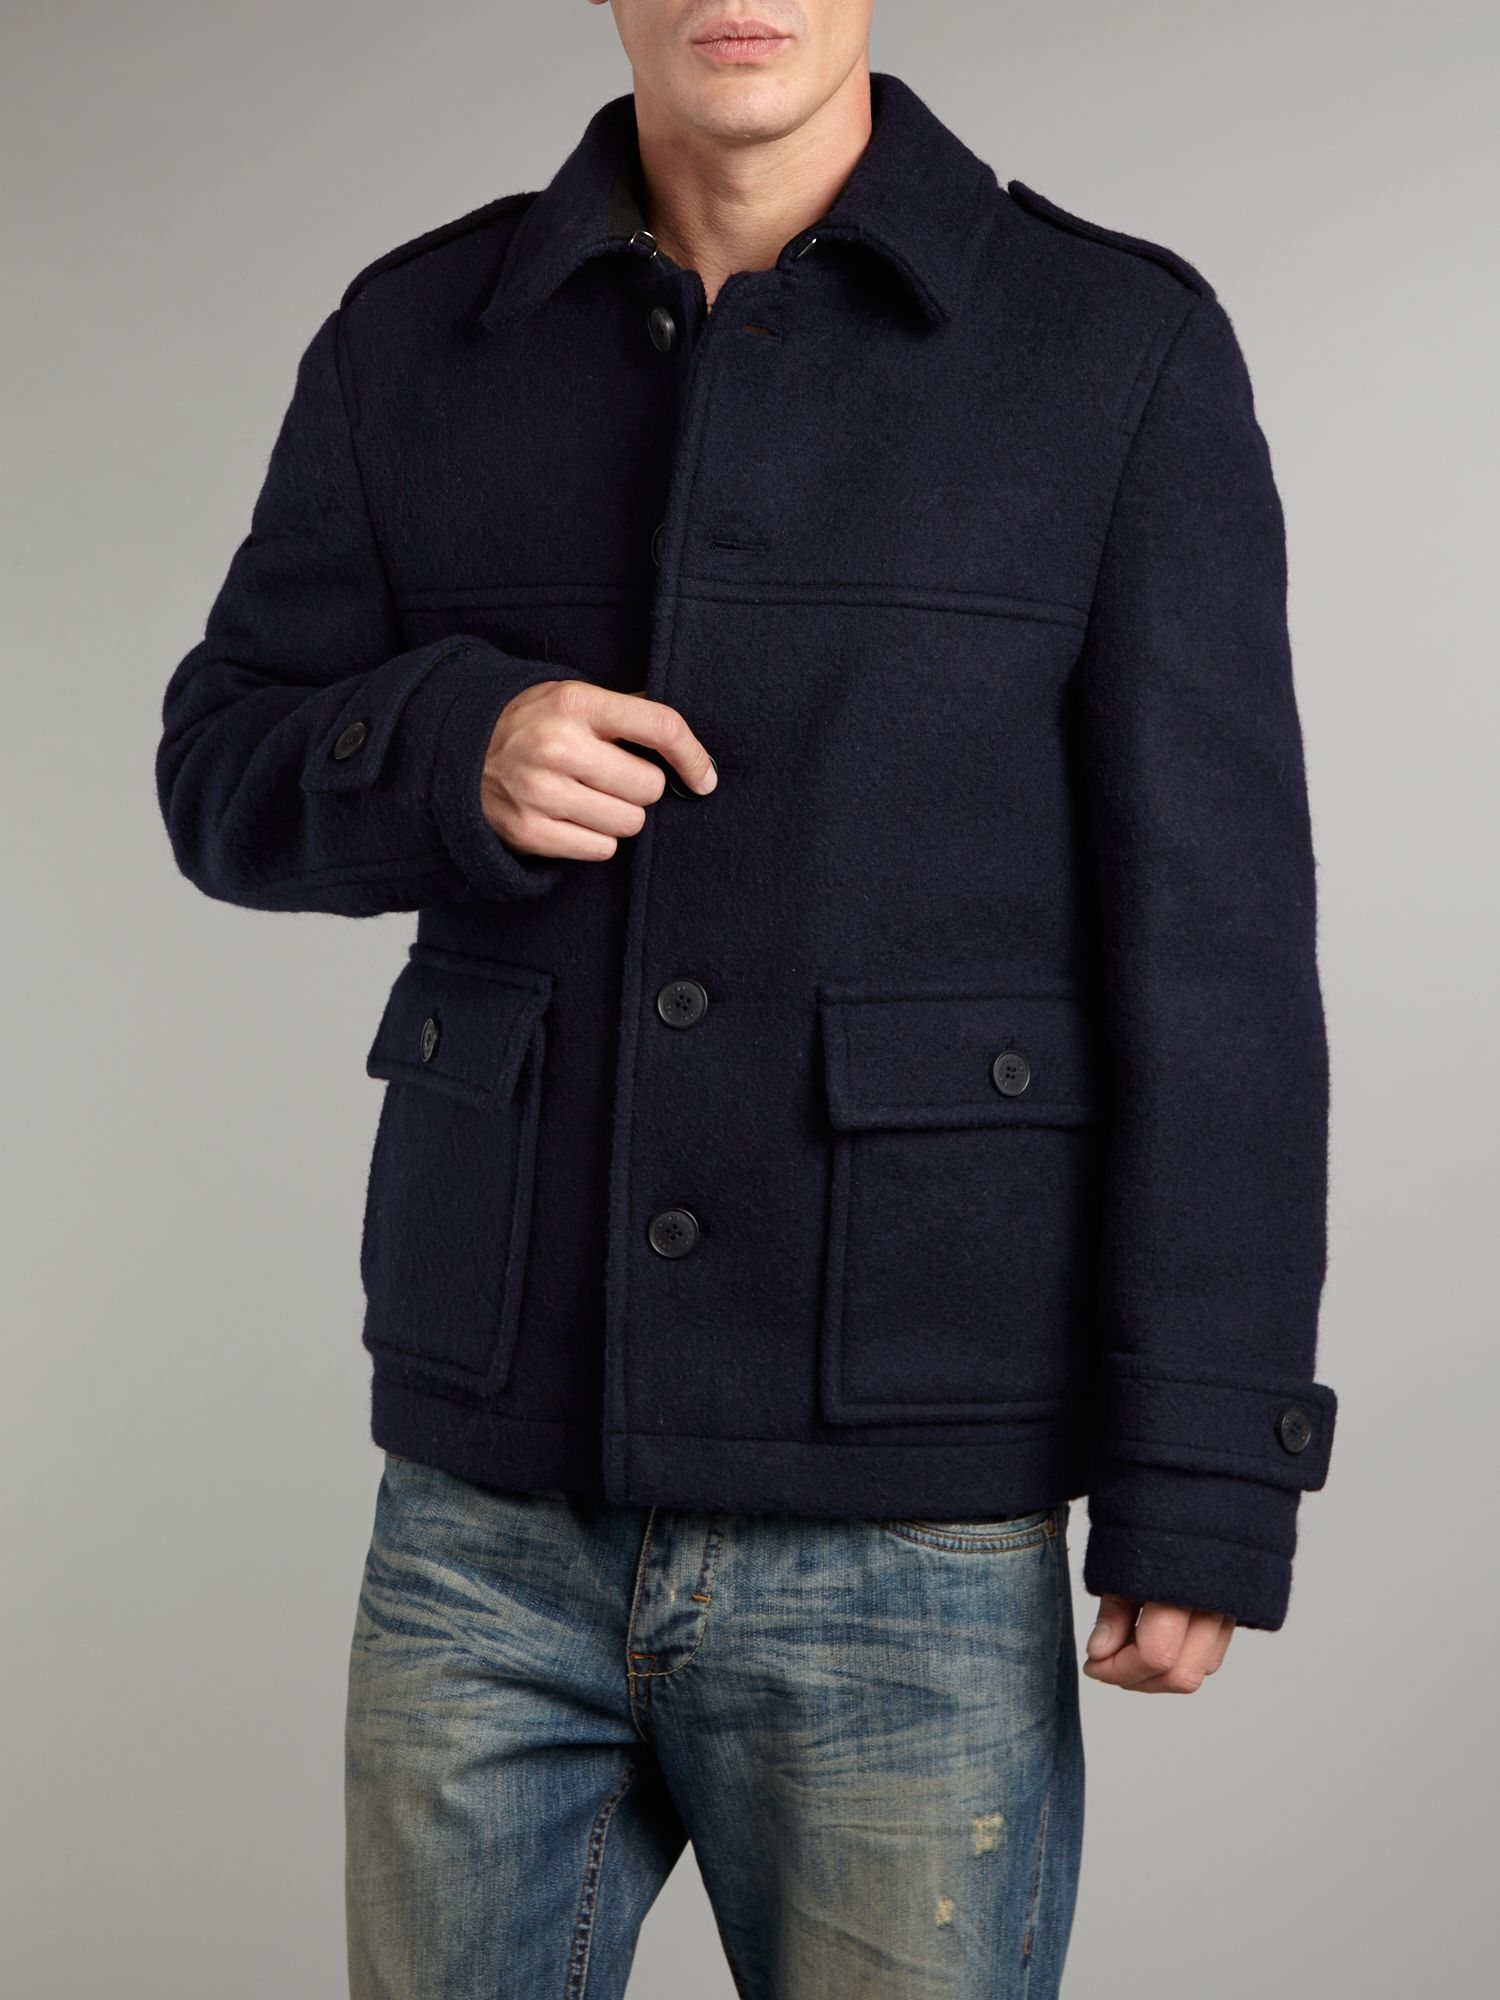 Farrell Donkey Jacket In Navy Blue For Men Lyst